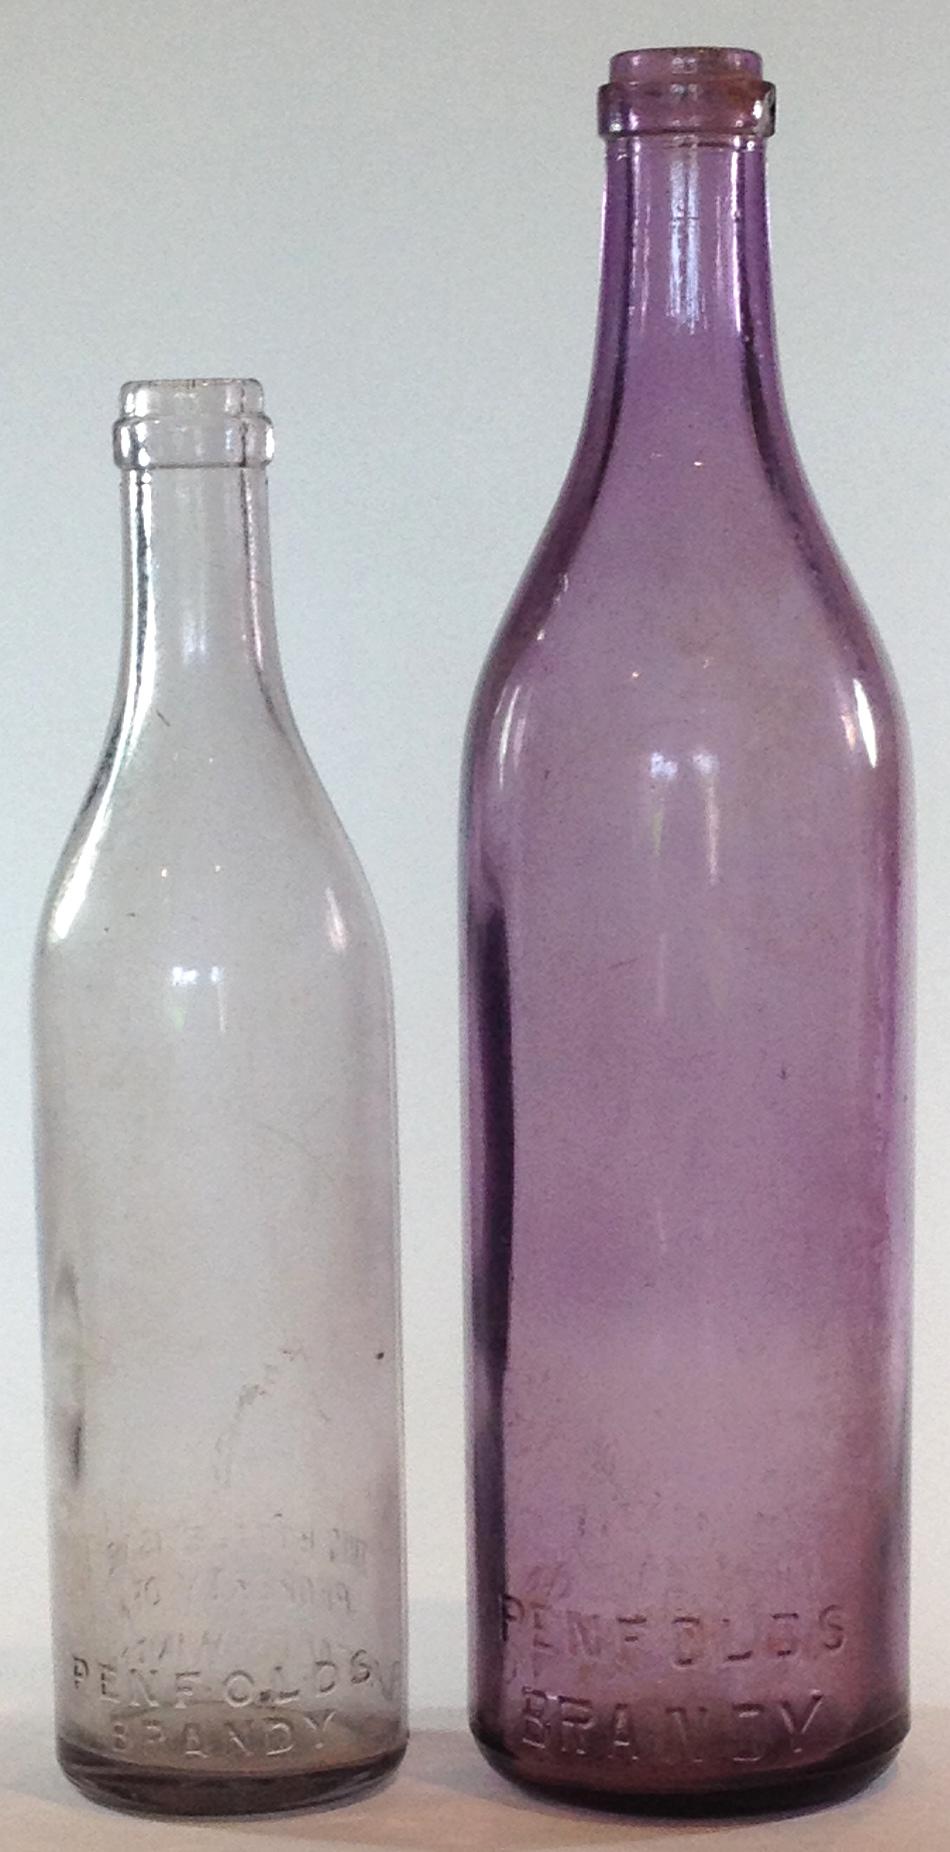 Large & Small Penfolds Brandy bottles. Circa 1920s.